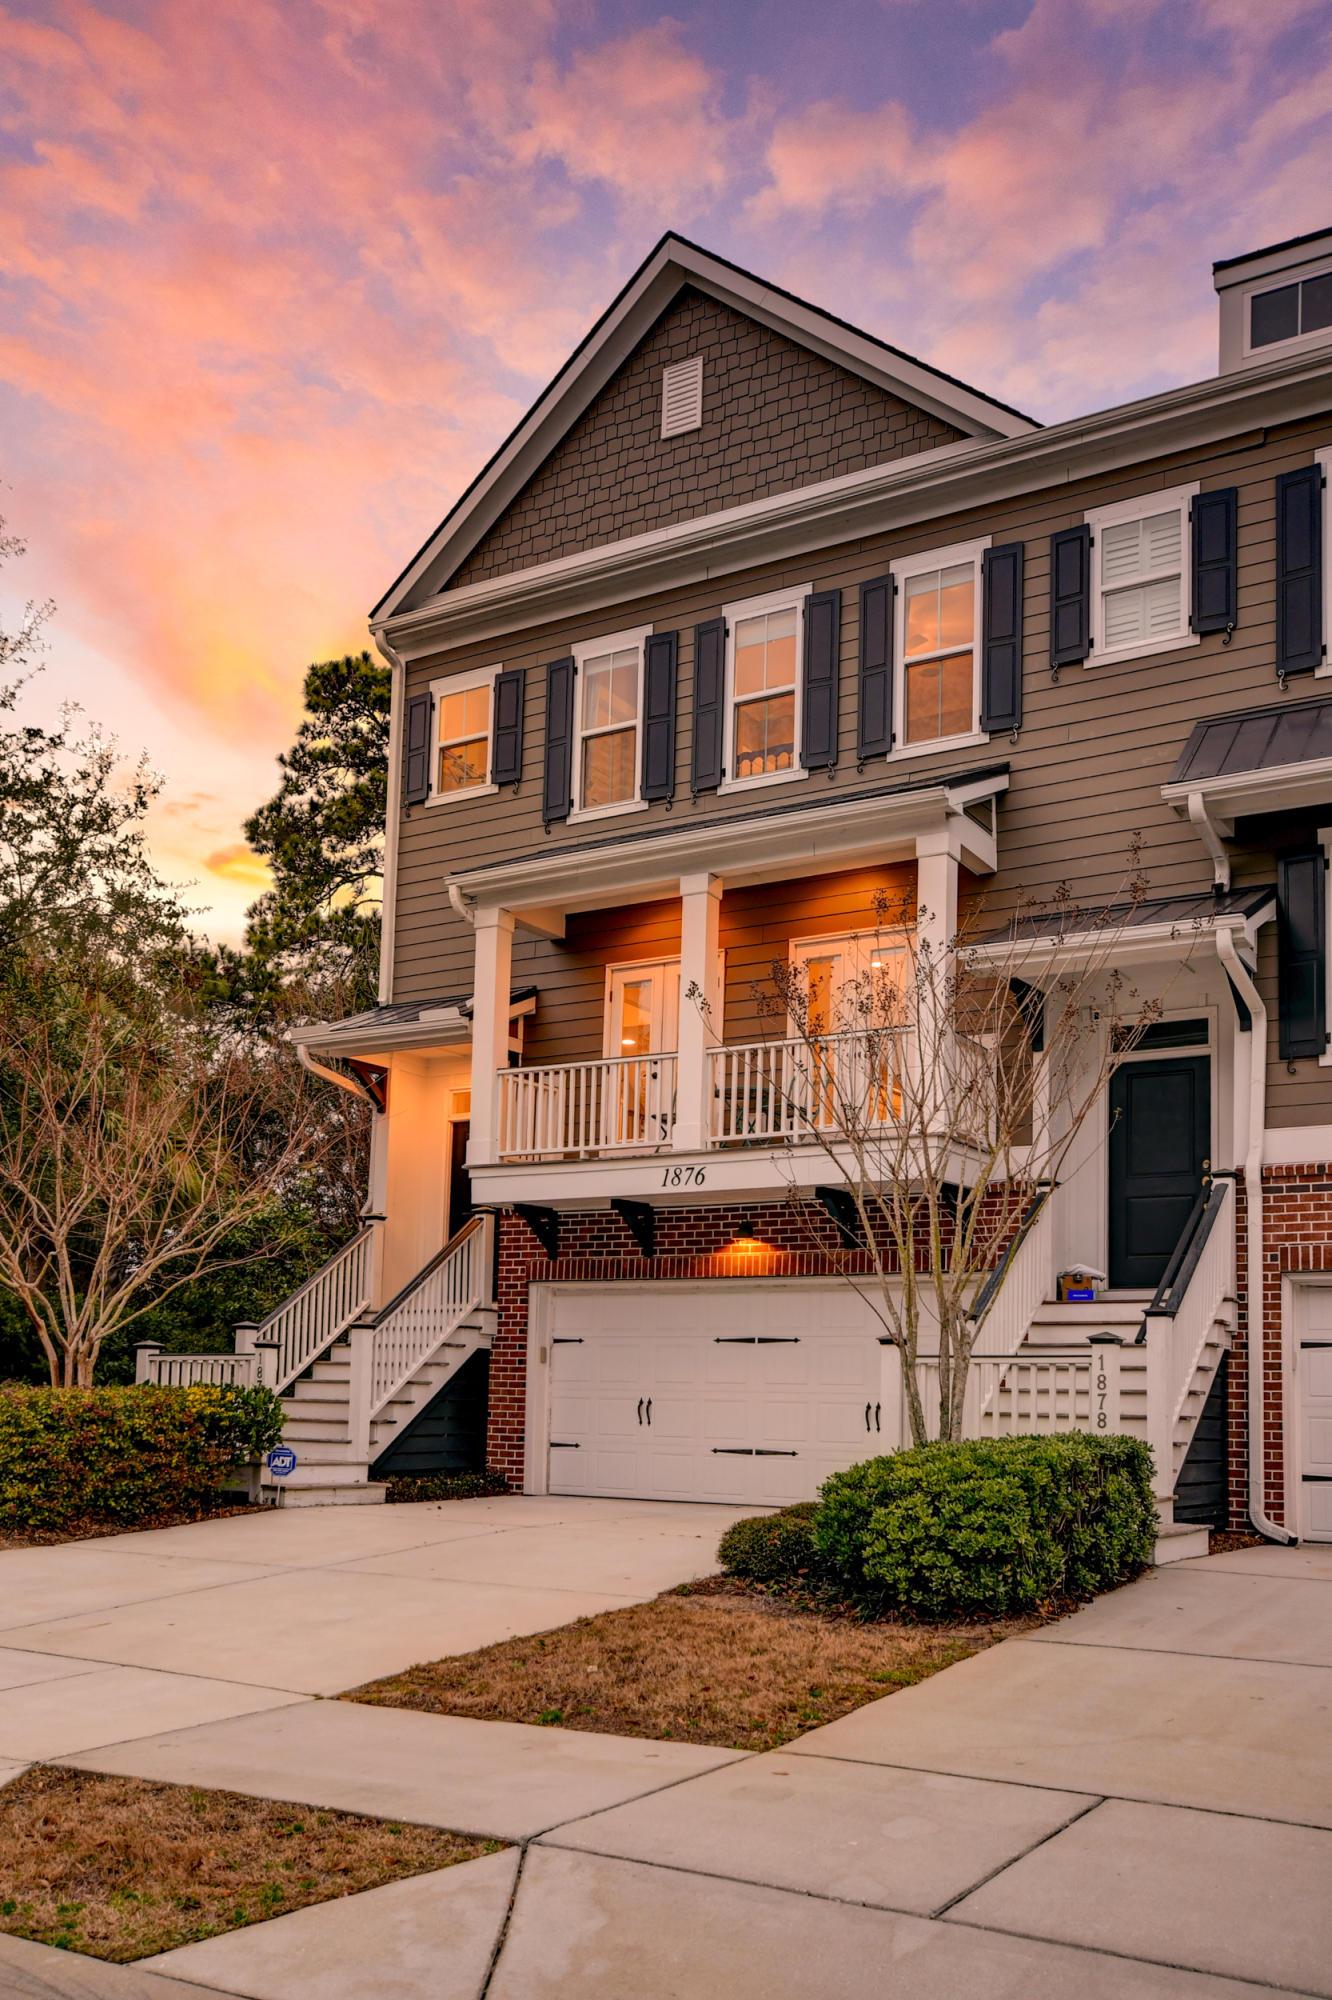 Carolina Walk Homes For Sale - 1876 Carolina Towne, Mount Pleasant, SC - 3